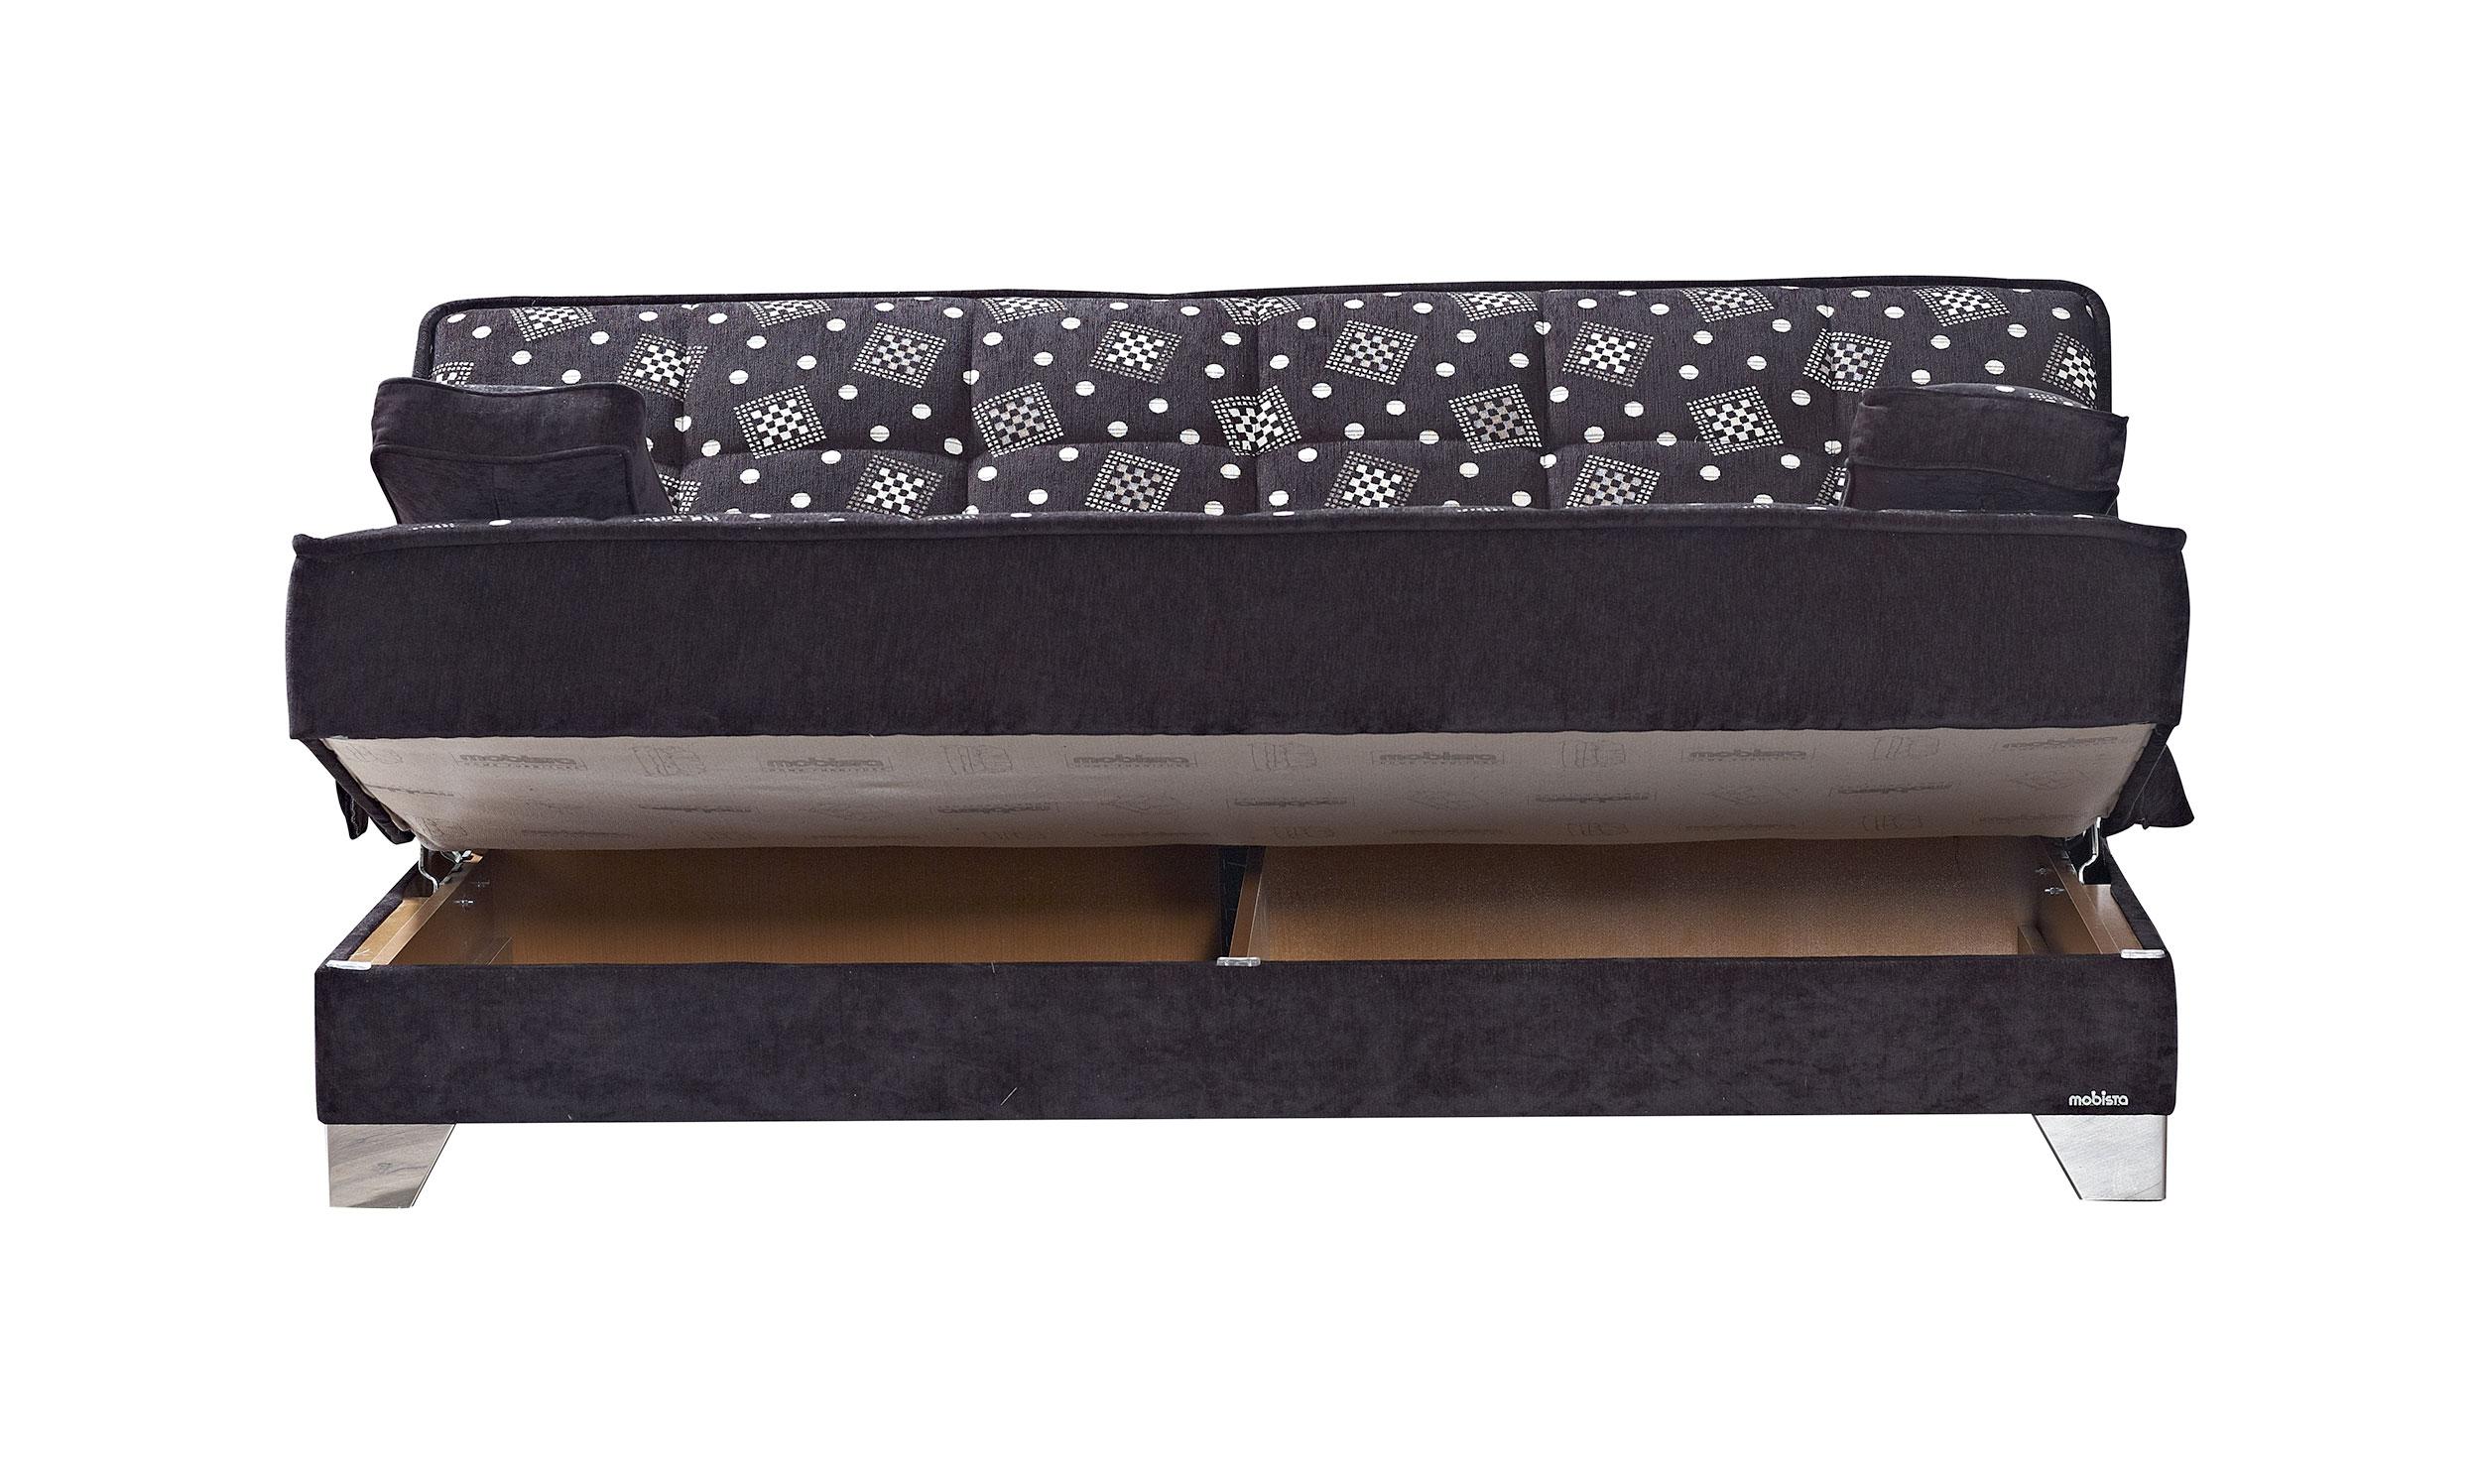 index mulberry sofa bed cover maker singapore inter mebel nova black by mobista